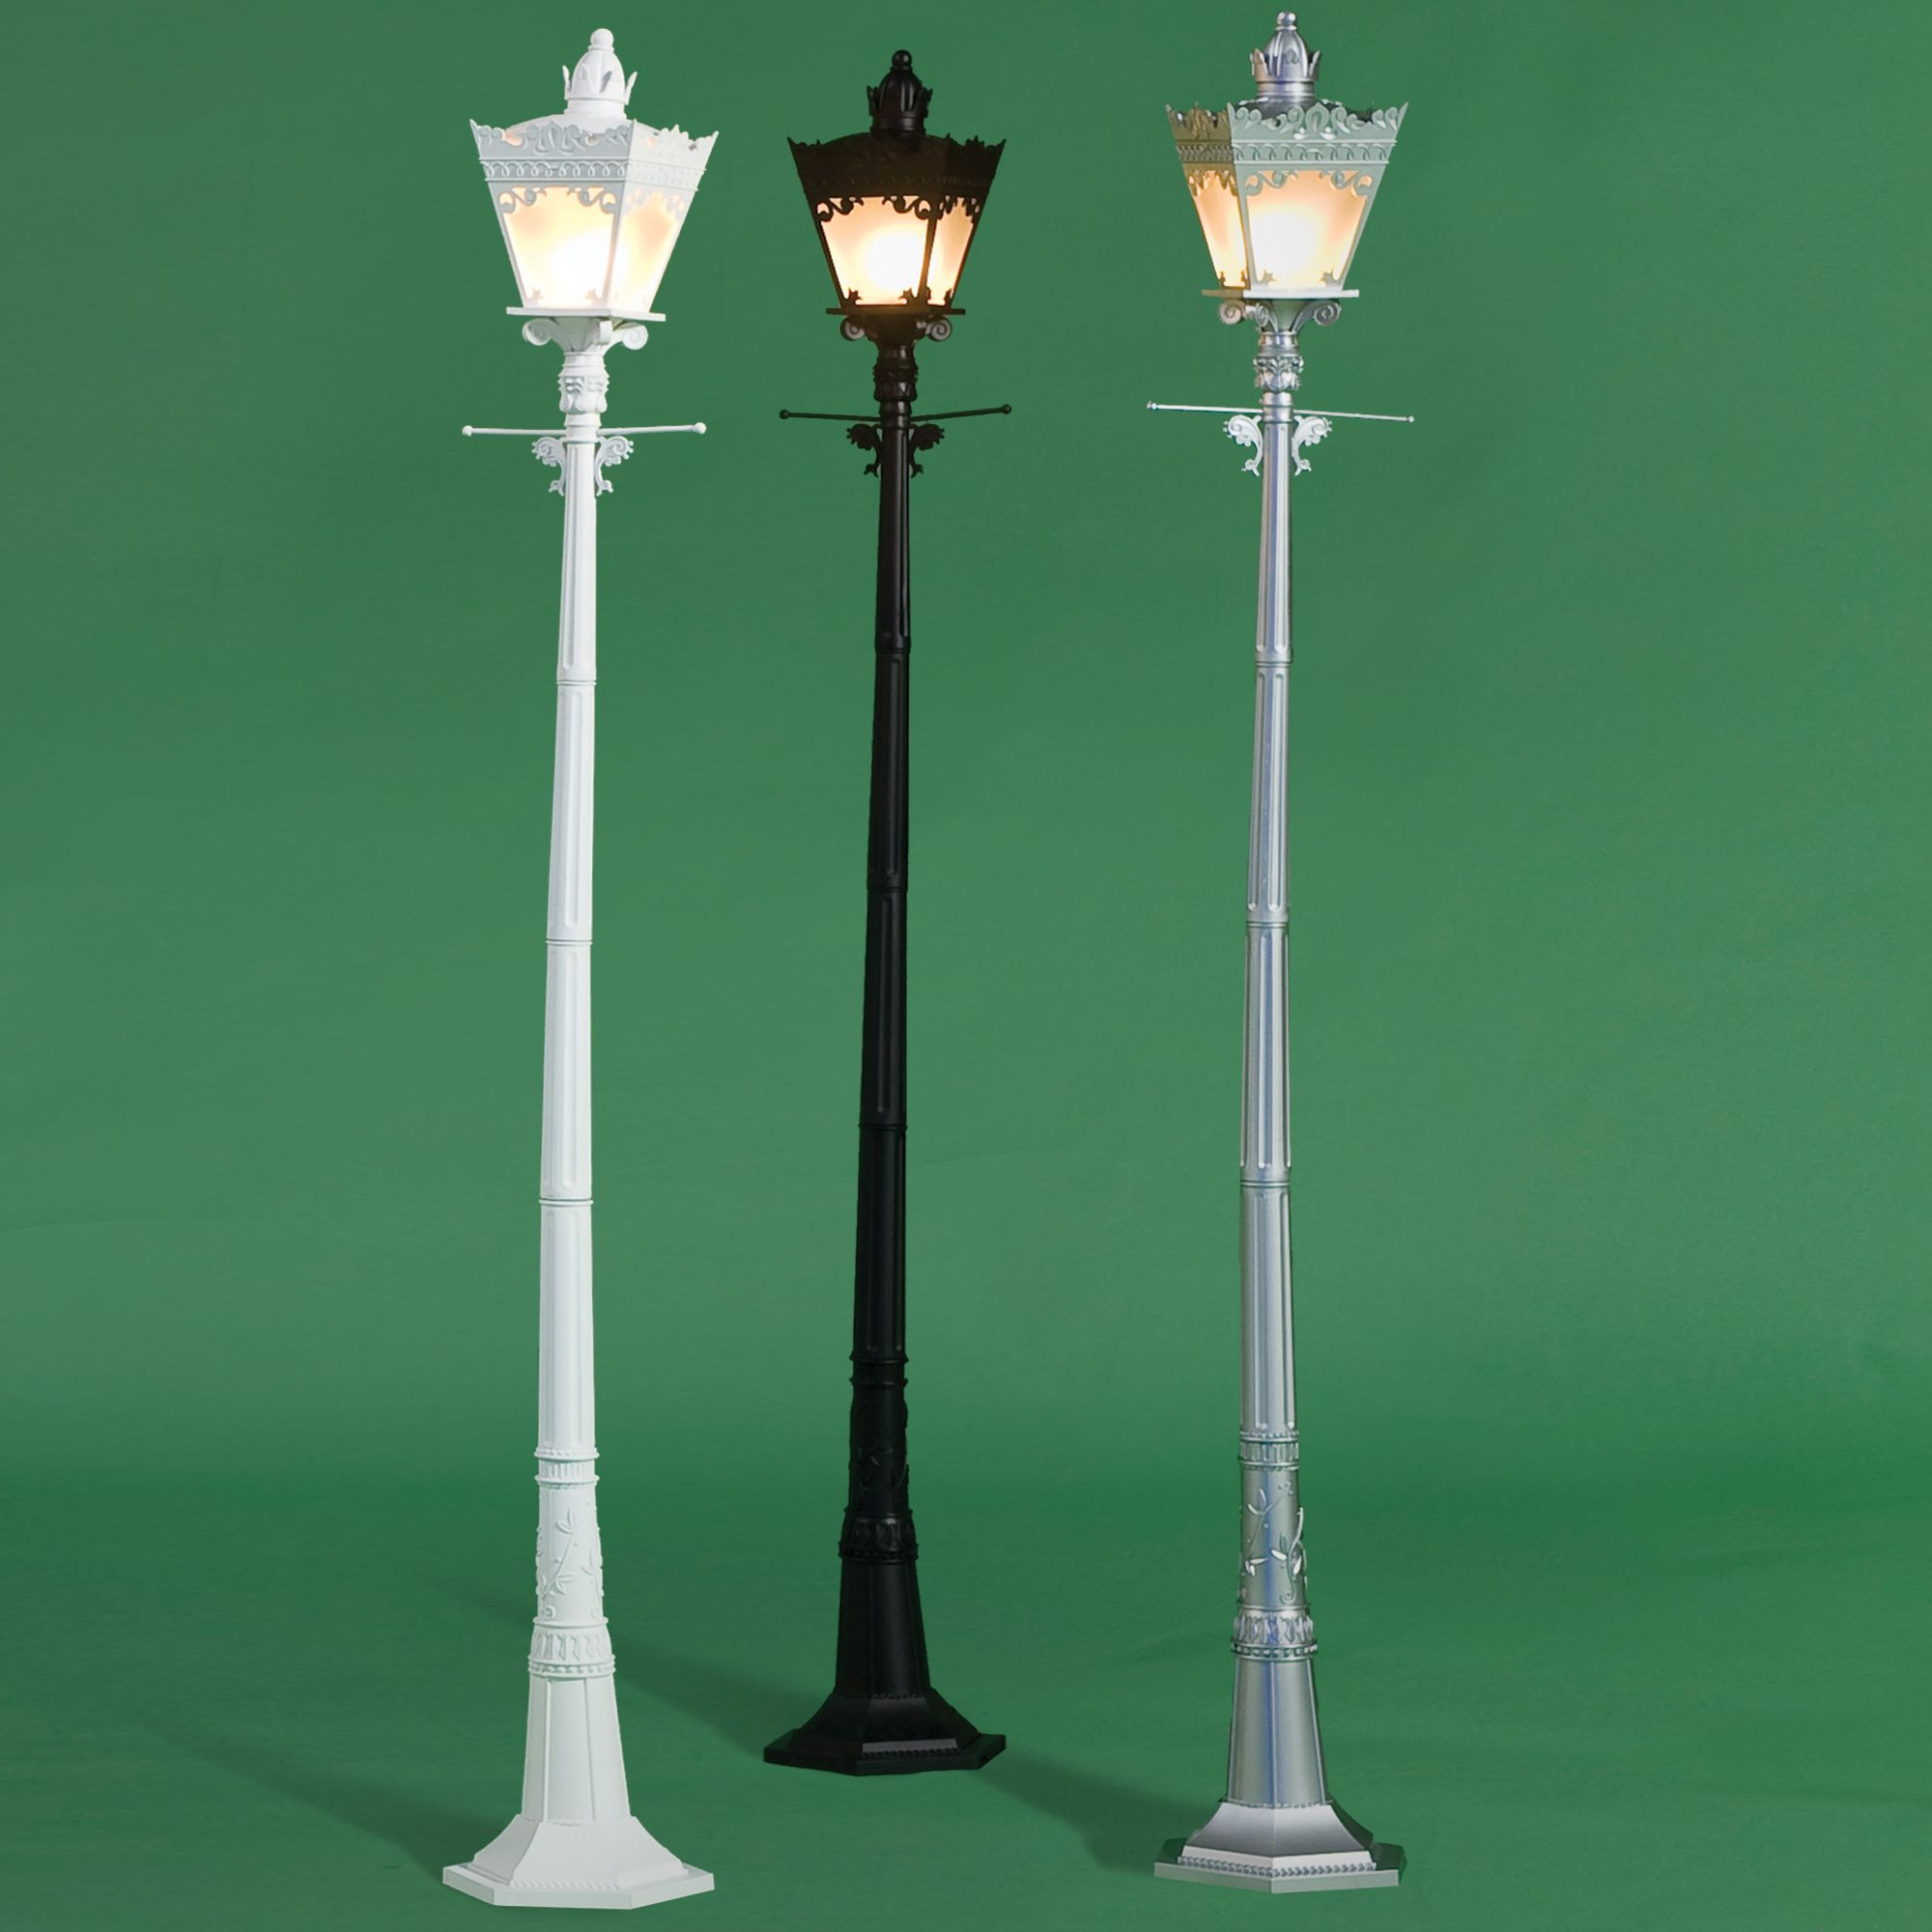 Decorative City Street Light Lamp Post Lights Street Lamp Victorian Outdoor Lighting